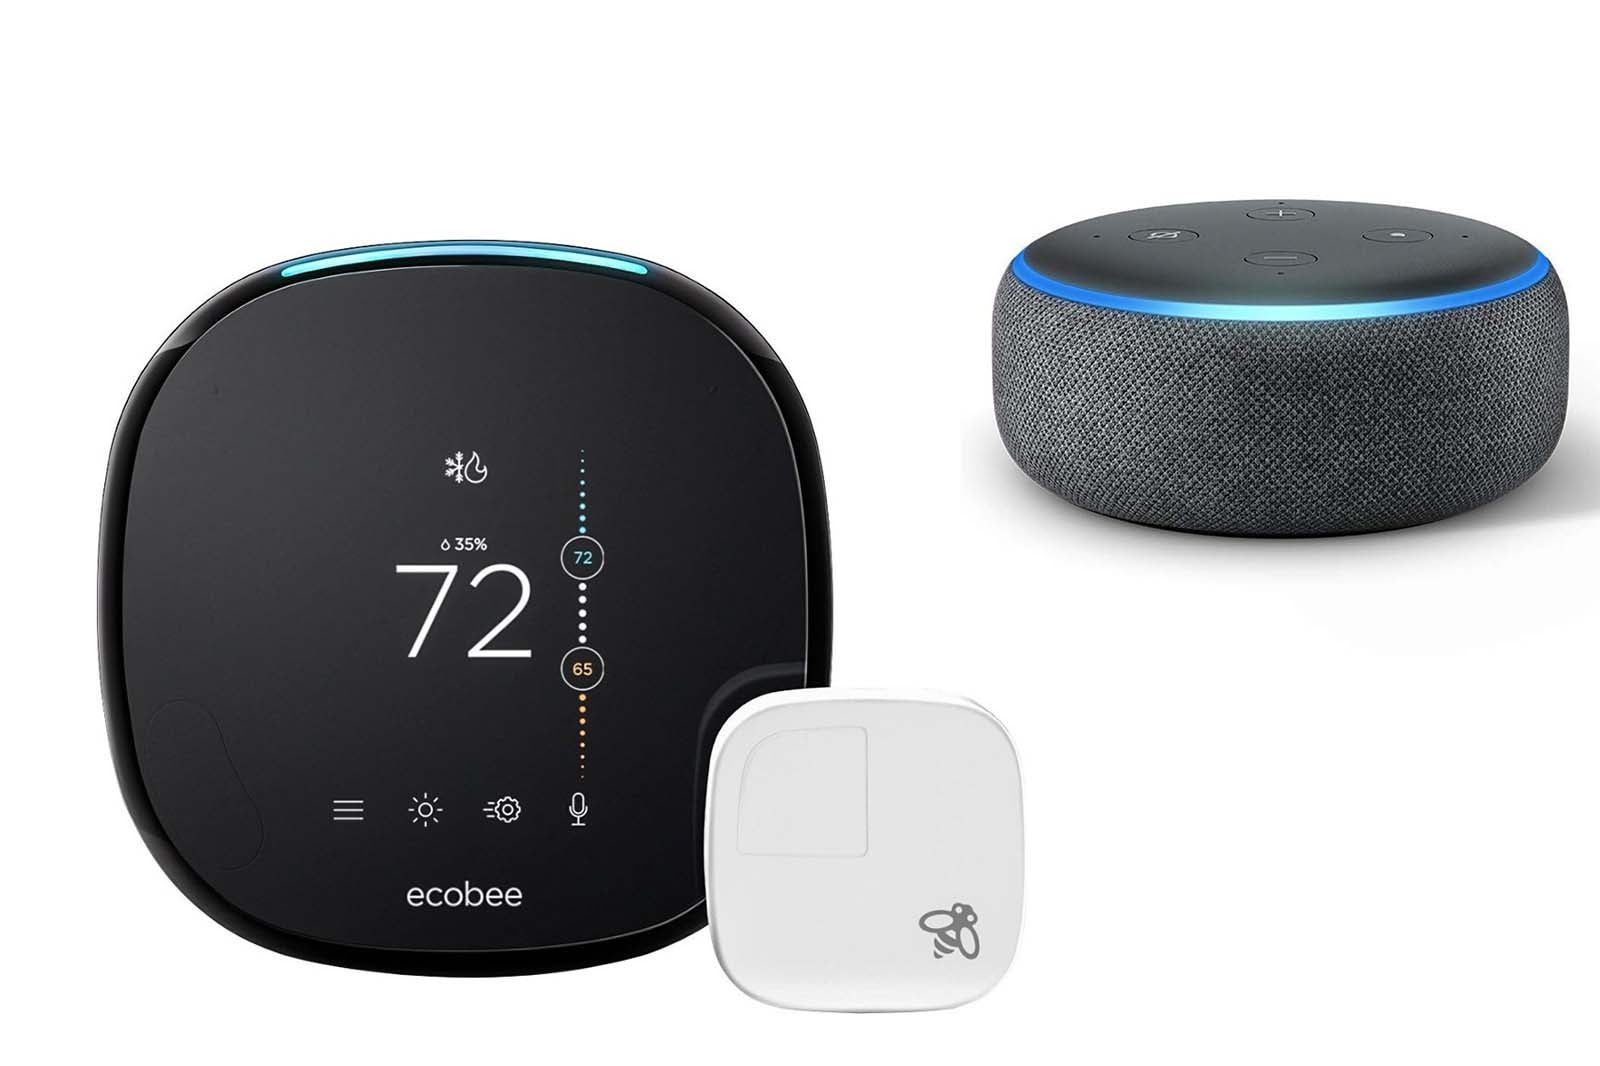 ecobee4 Smart Thermostat + Echo Dot (3rd Gen).